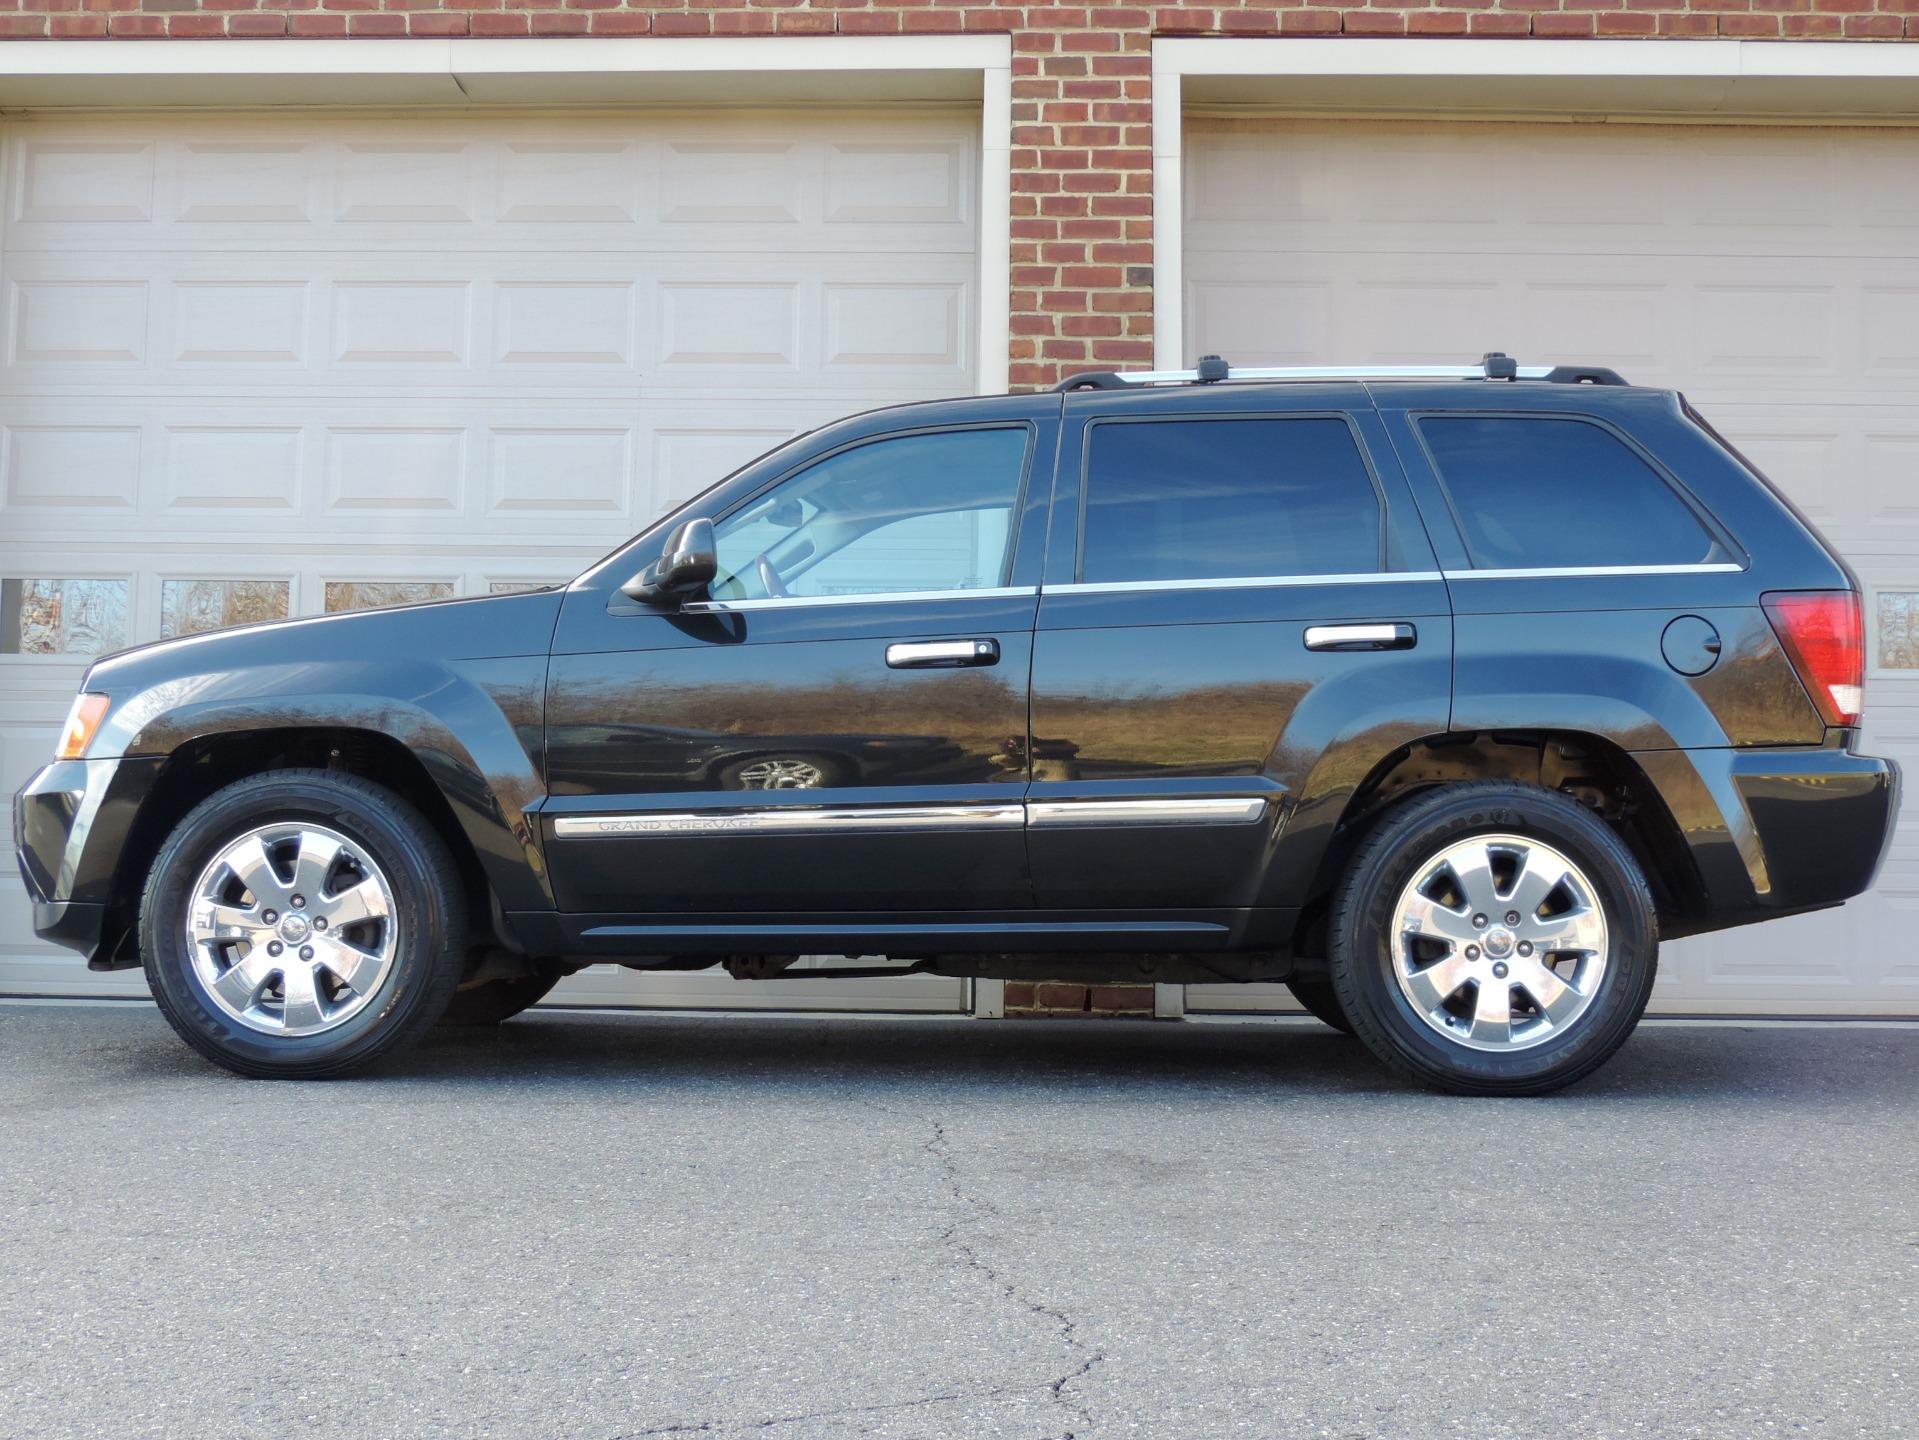 2009 Jeep Grand Cherokee Overland Stock 508119 For Sale Near Edgewater Park Nj Nj Jeep Dealer